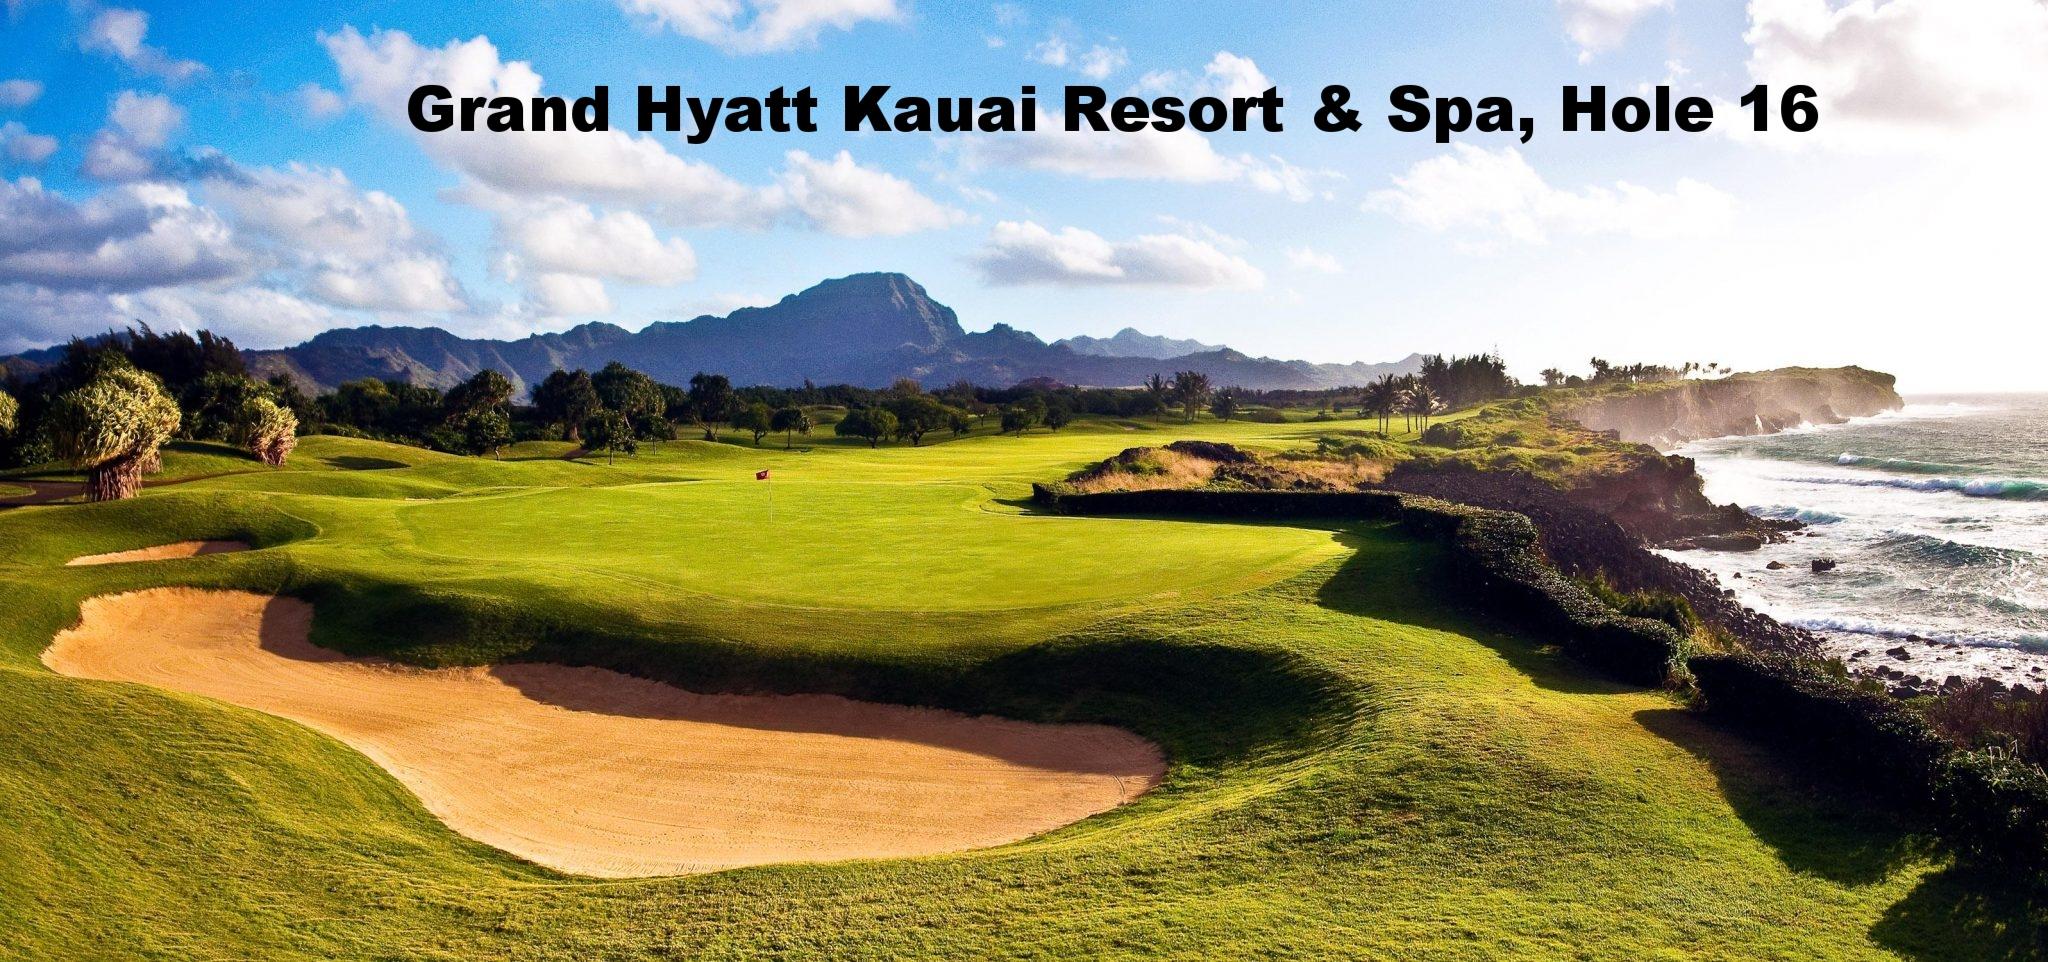 Grand-Hyatt-Kauai-Resort-and-Spa-Golf-Course-Hole-16.jpg